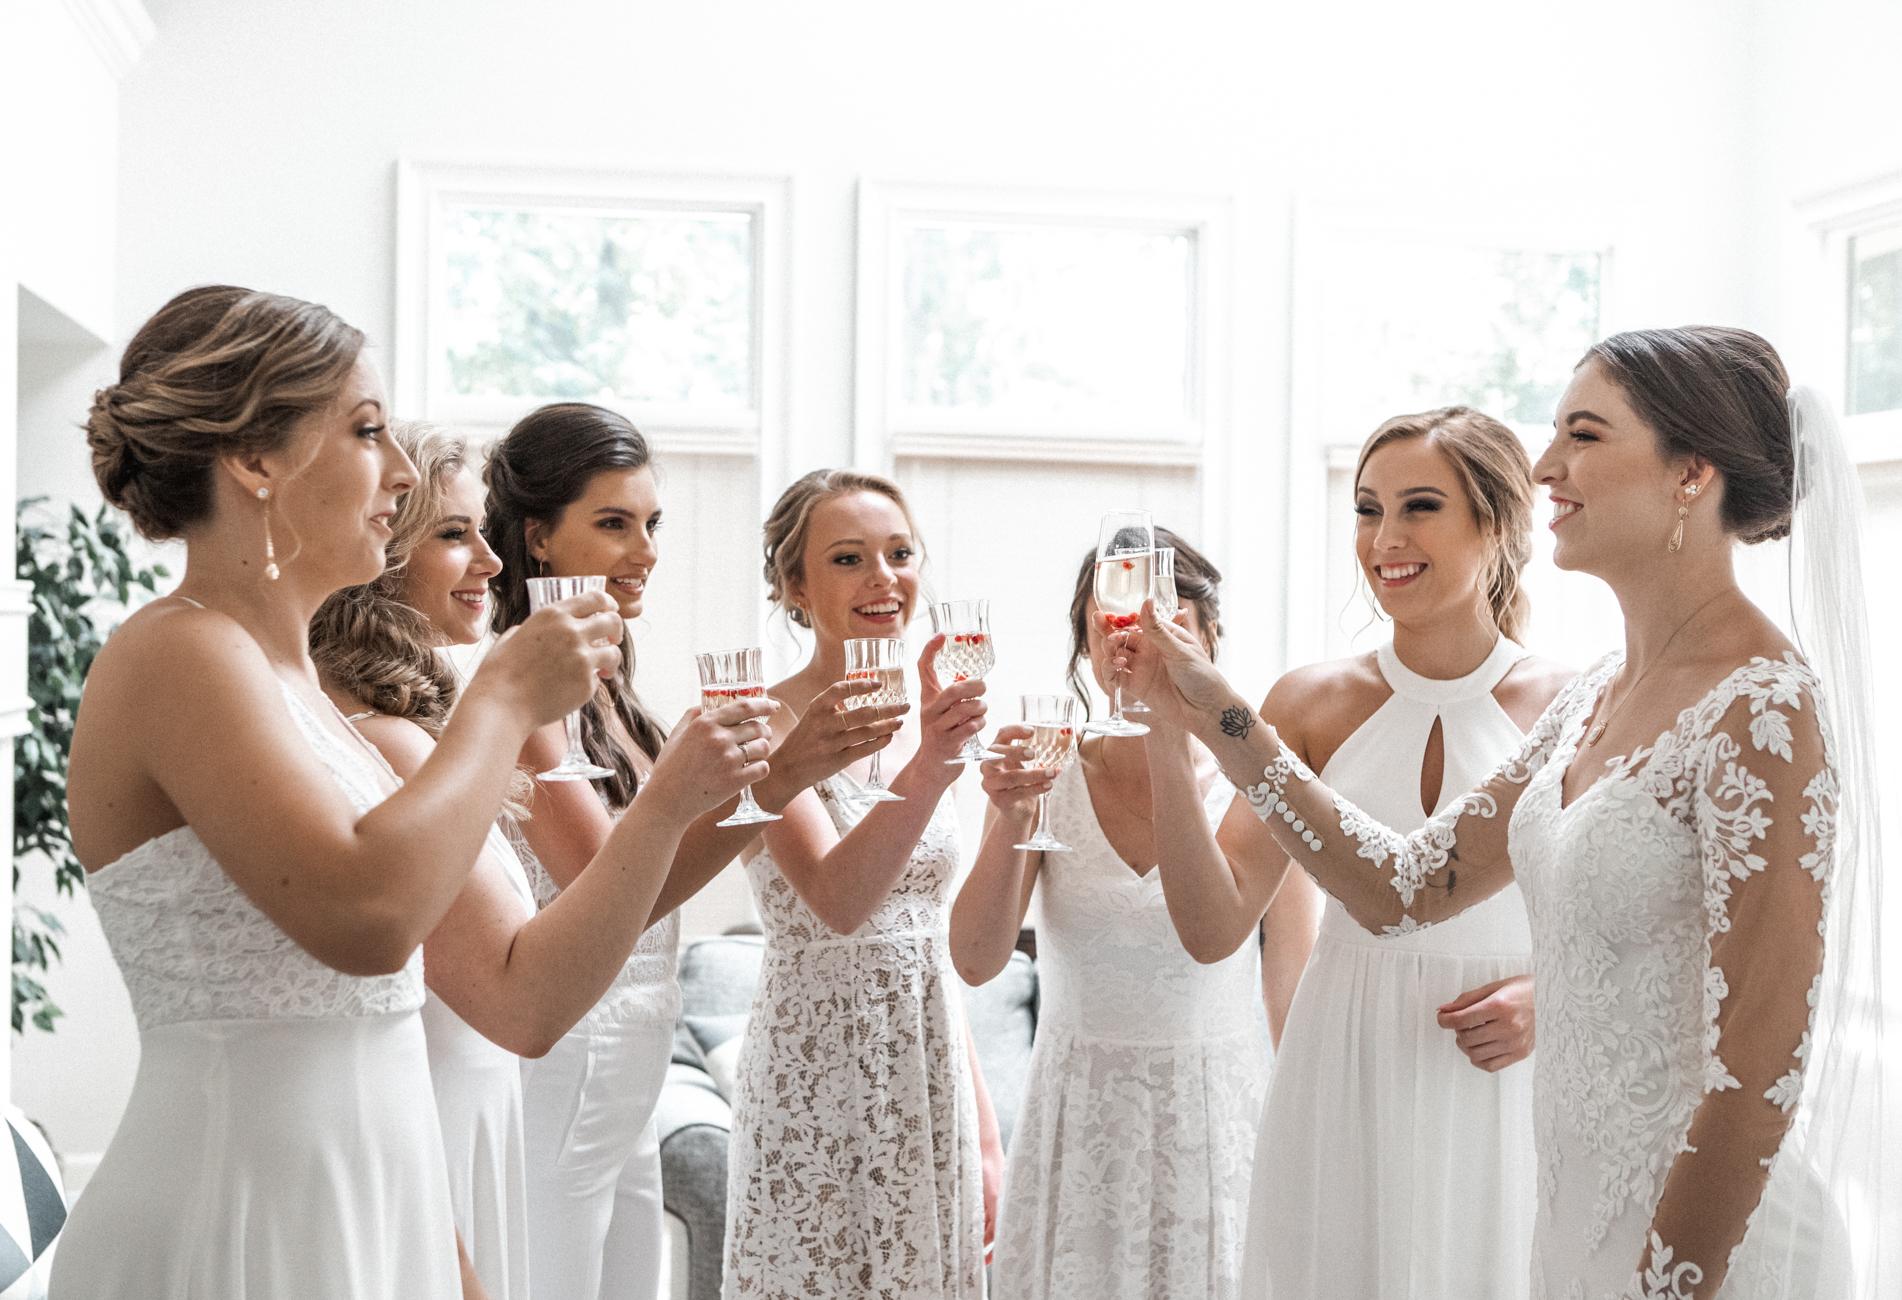 Wedding Day Small-9.jpg